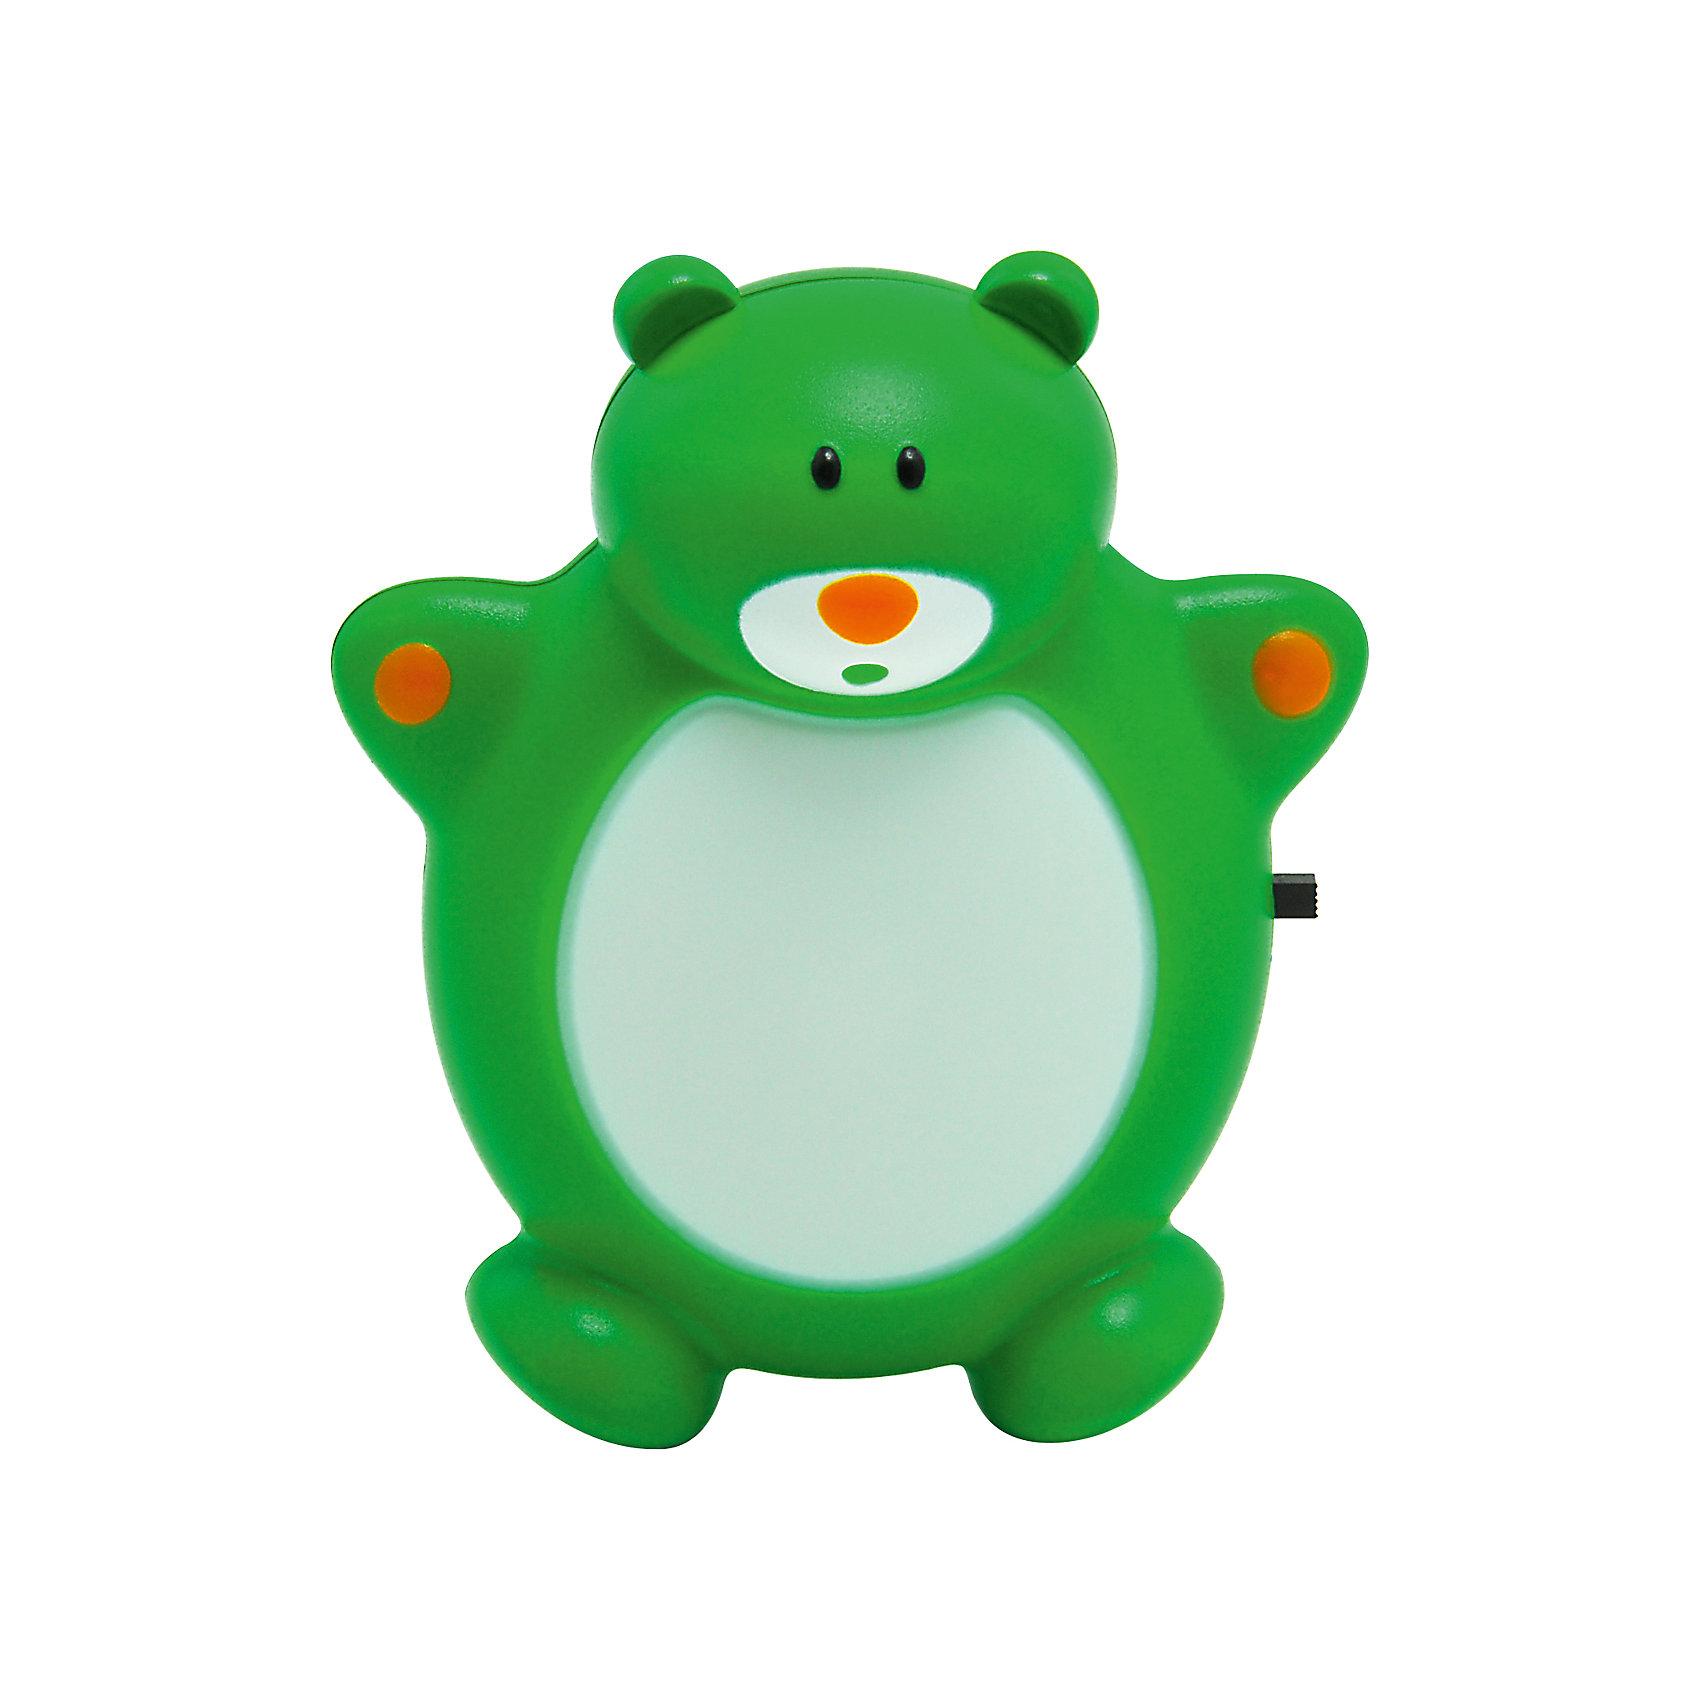 Ultra Light Ночник Медведь Зоо LED 0.5Вт, Ultra Light, зелёный светильник ночник kt002a зелёный